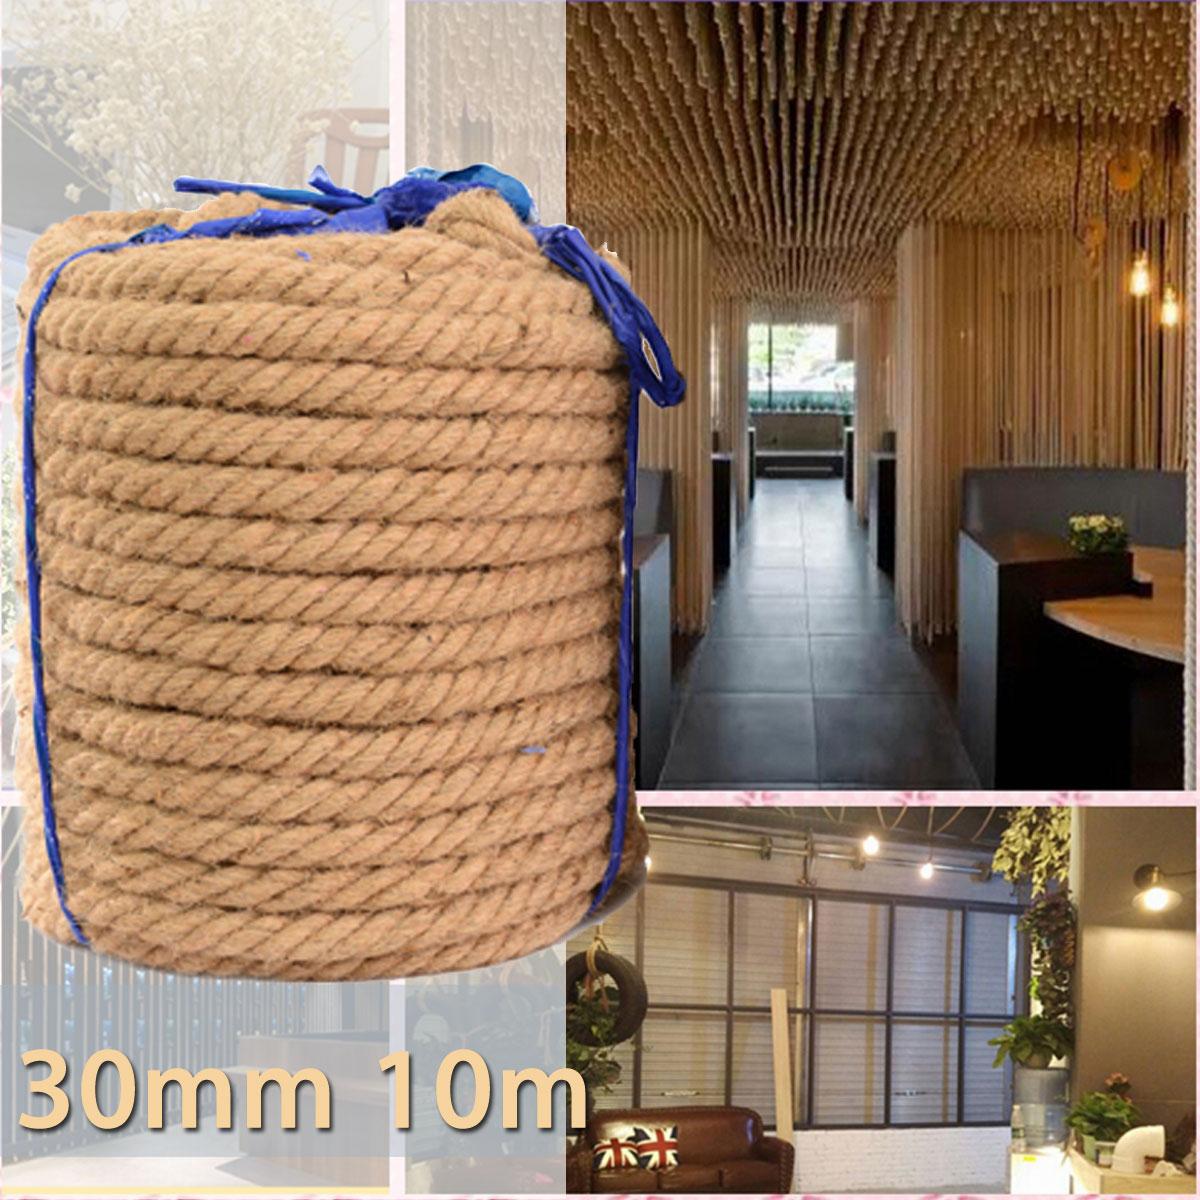 Interior Design Fai Da Te whateverittakes-iwillbewaiting: offerte kiwarm 30 millimetri